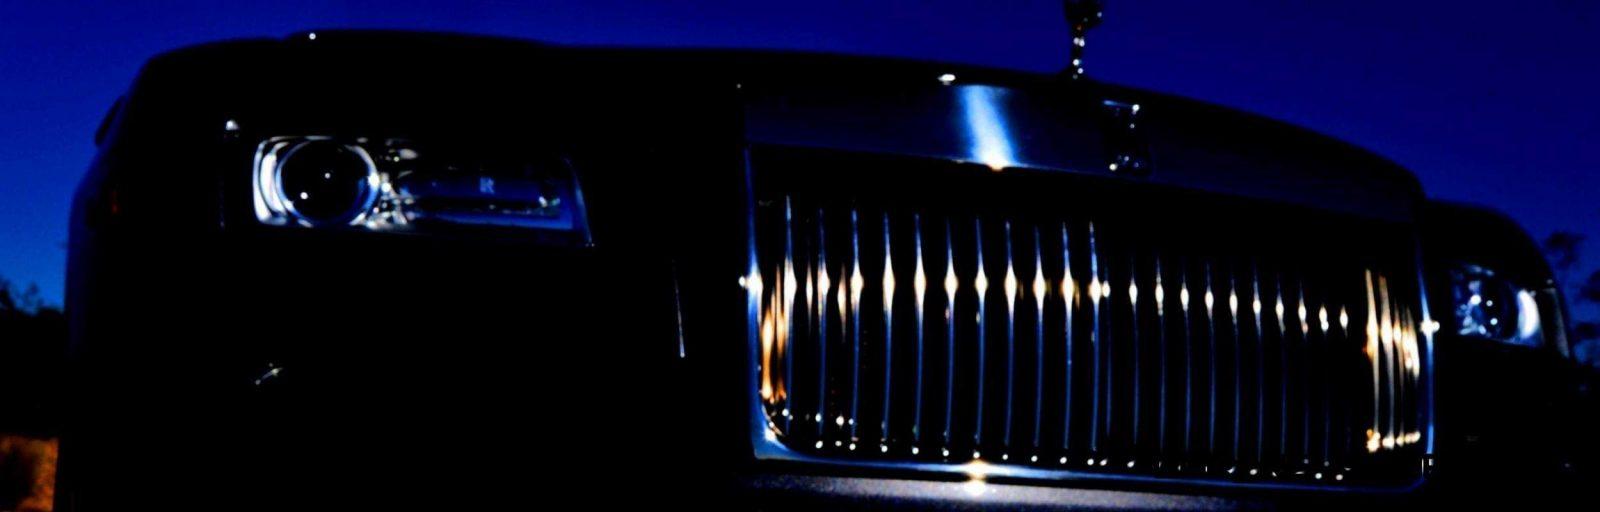 62 Huge Wallpapers 2014 Rolls-Royce Wraith AZ 11-724